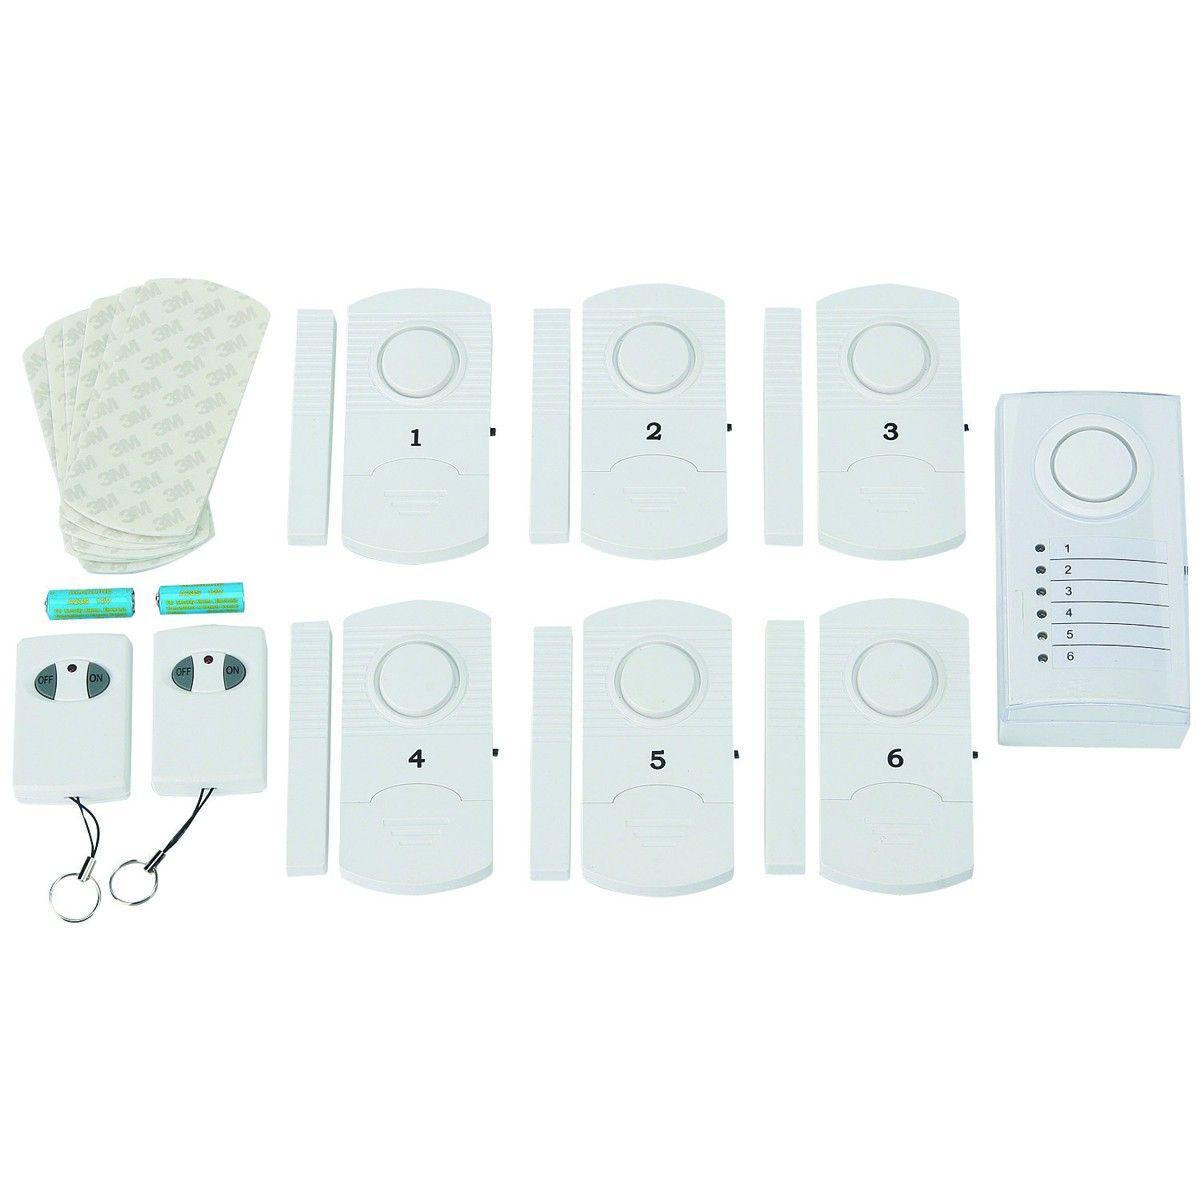 tiiwee Home Alarm System Starter Kit Alarmanlage mit 2 Fenster oder Tuer Senso